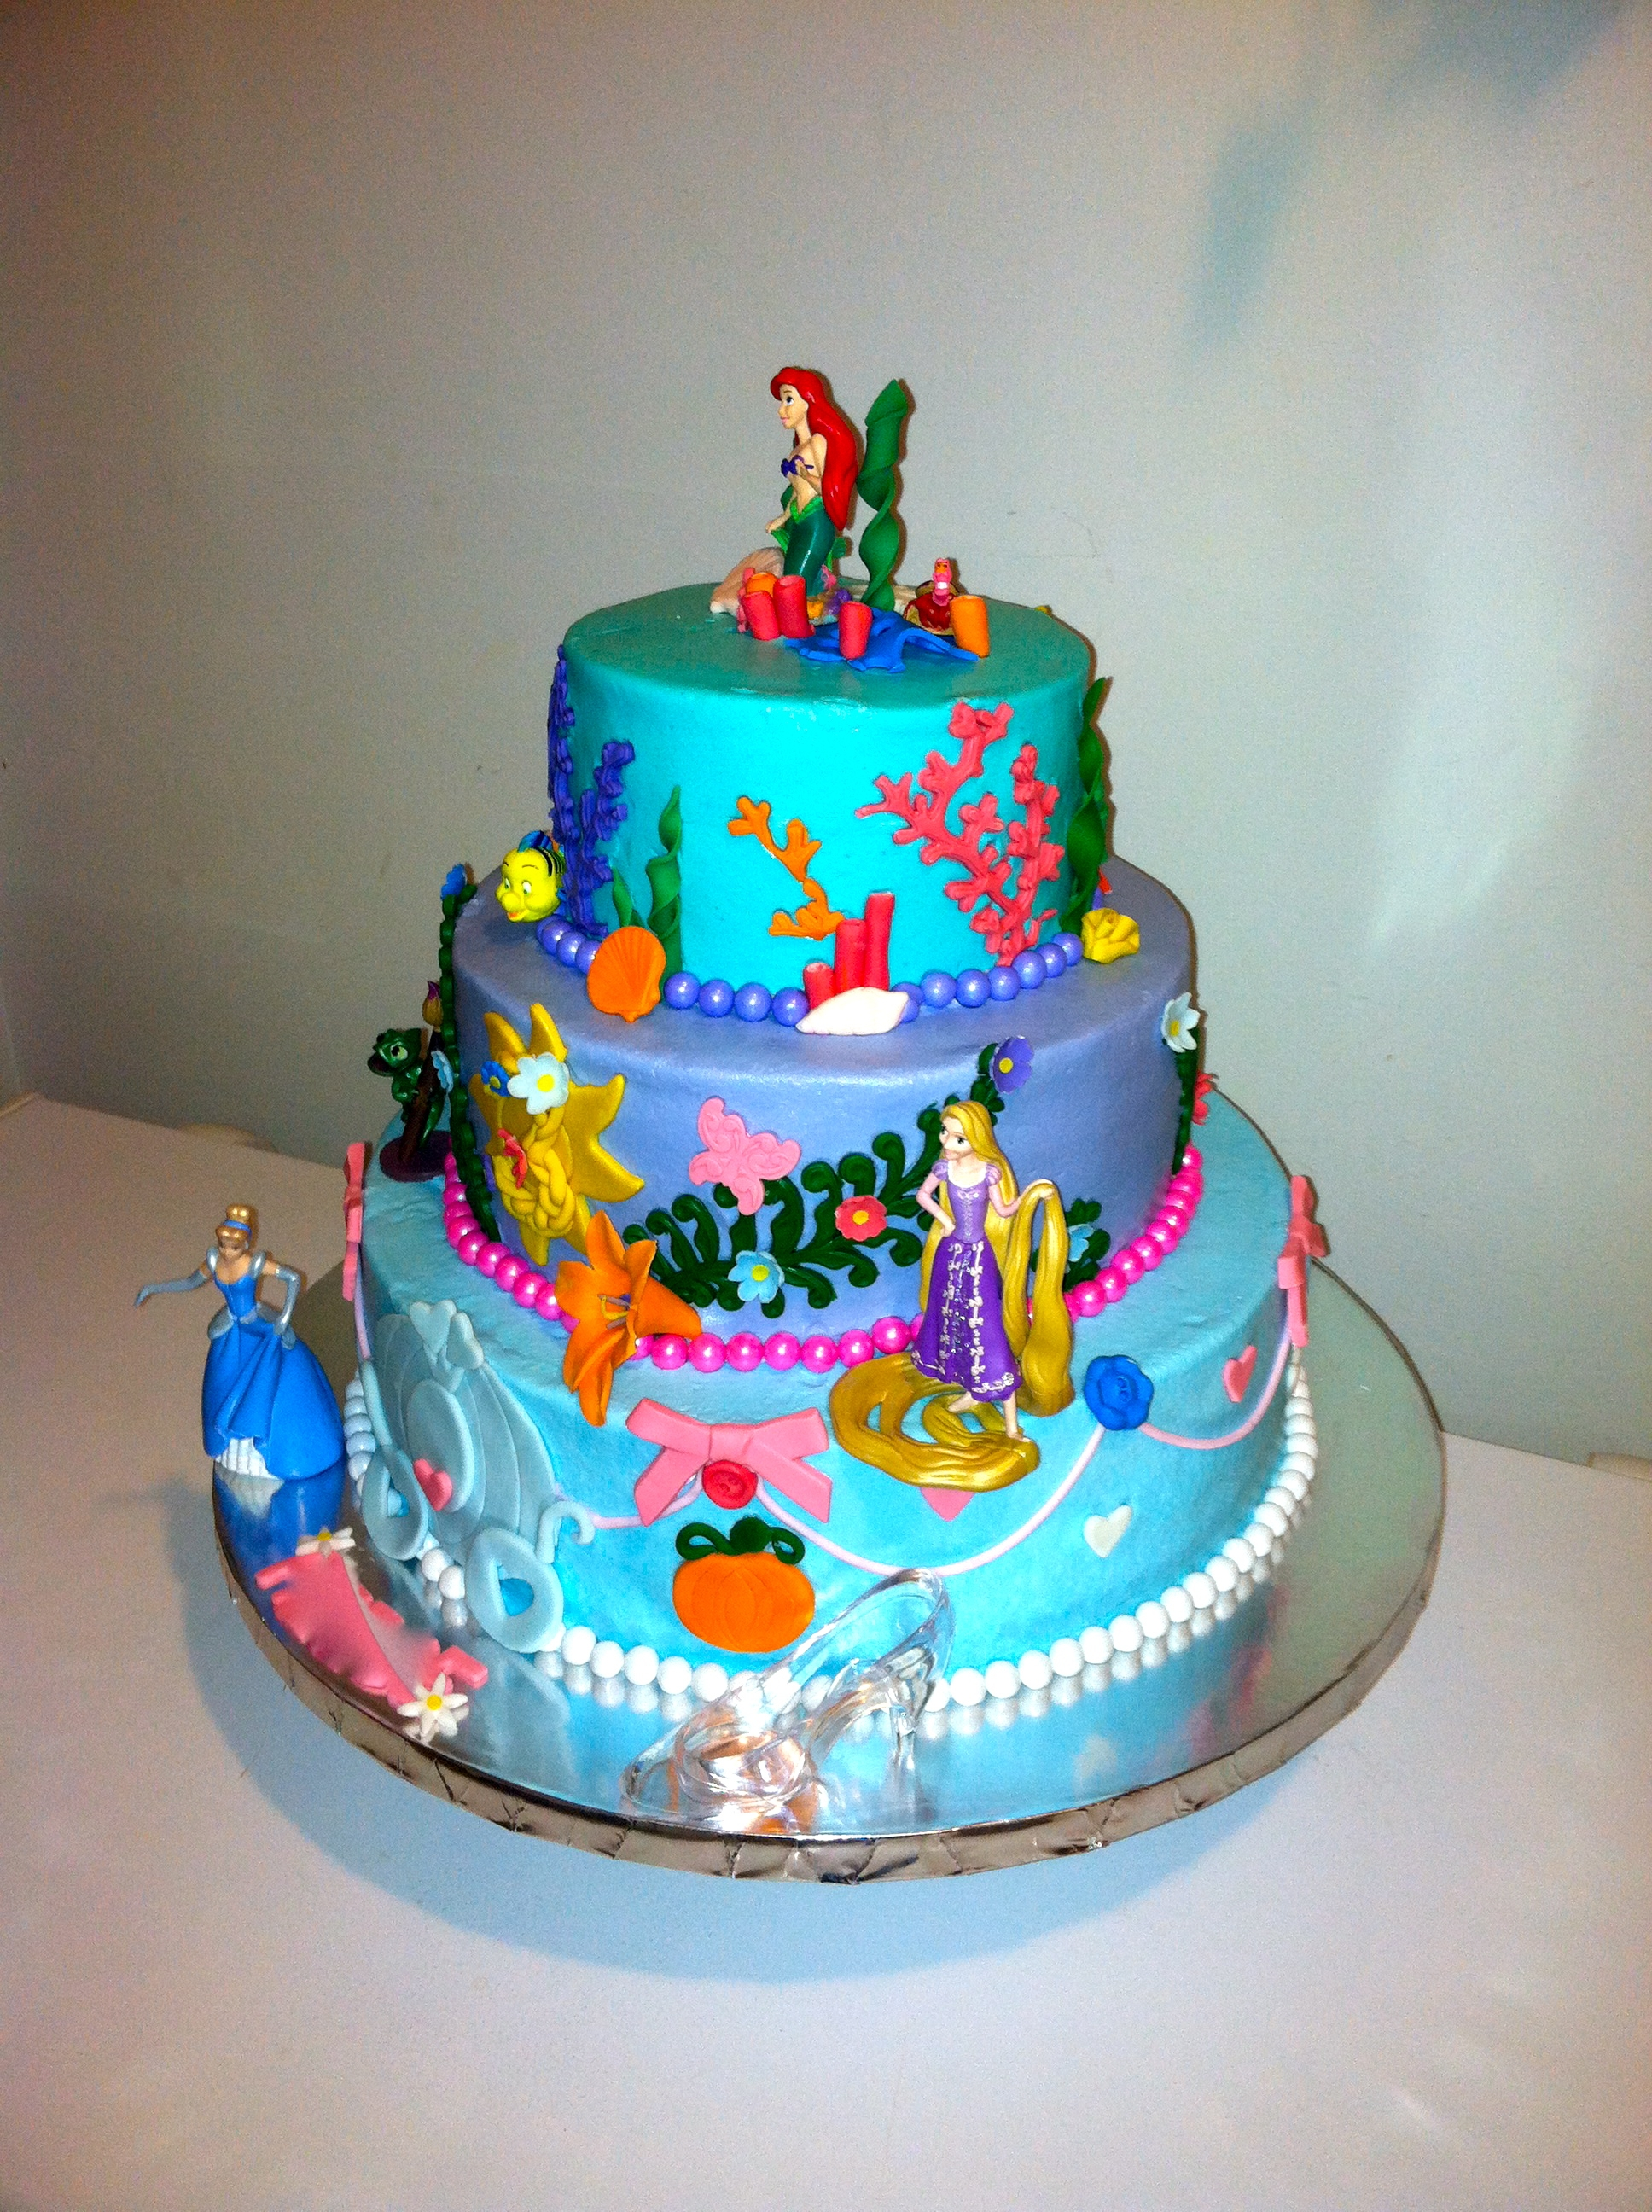 Cake Decoration Disney Princess : Disney Princess Cake Arial Rapunzel And Cinderella Bc ...